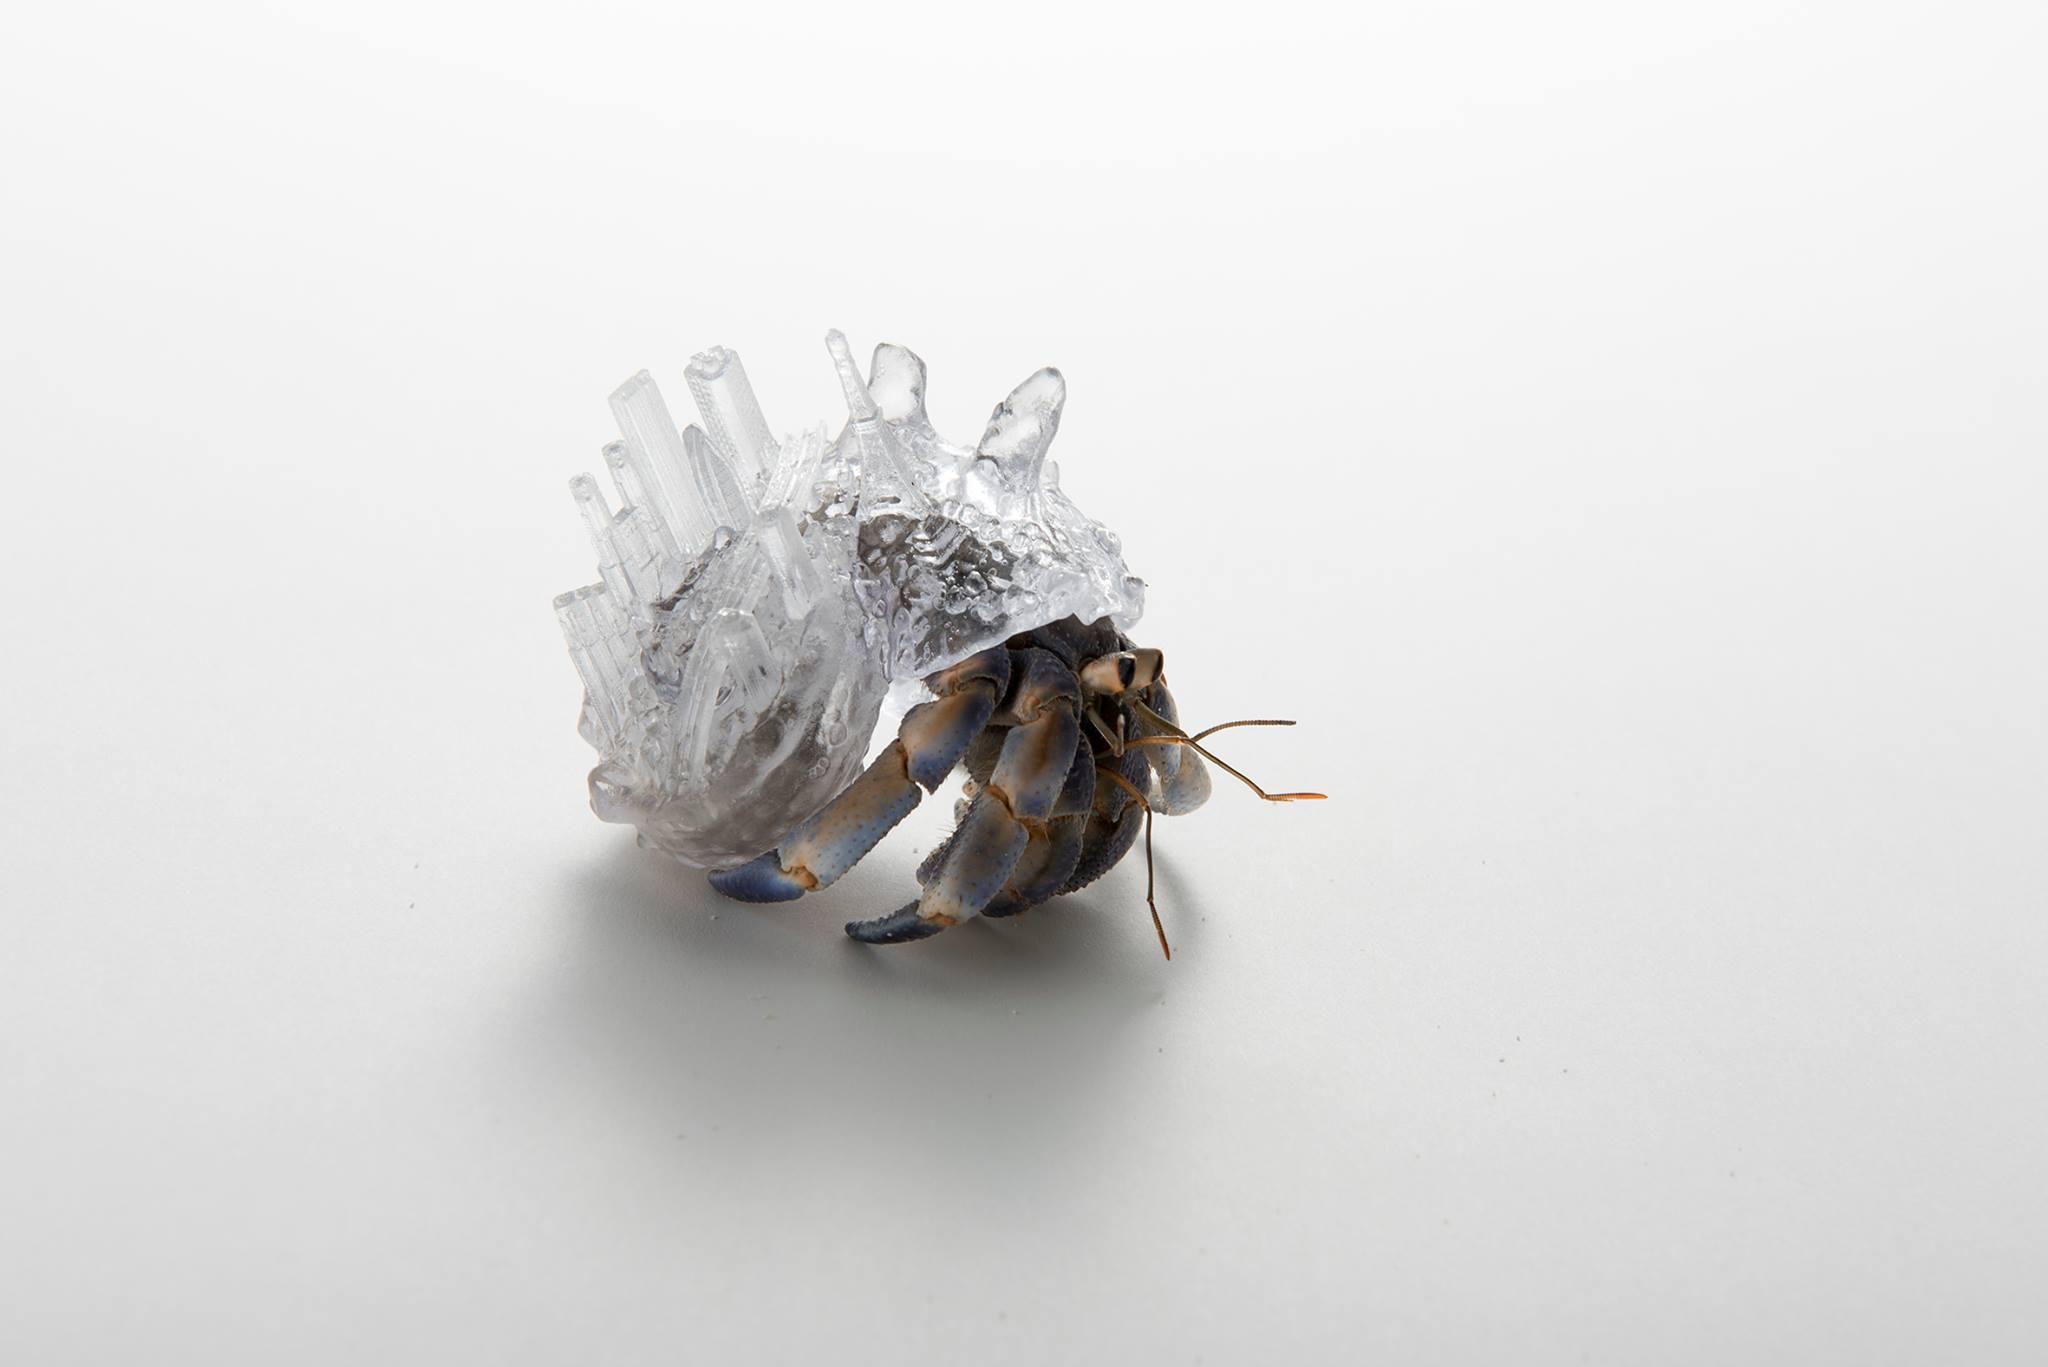 Exhibition: 東京エレクトロン solaé art gallery project 展示《やどかりに「やど」をわたしてみる-Tokyo-》